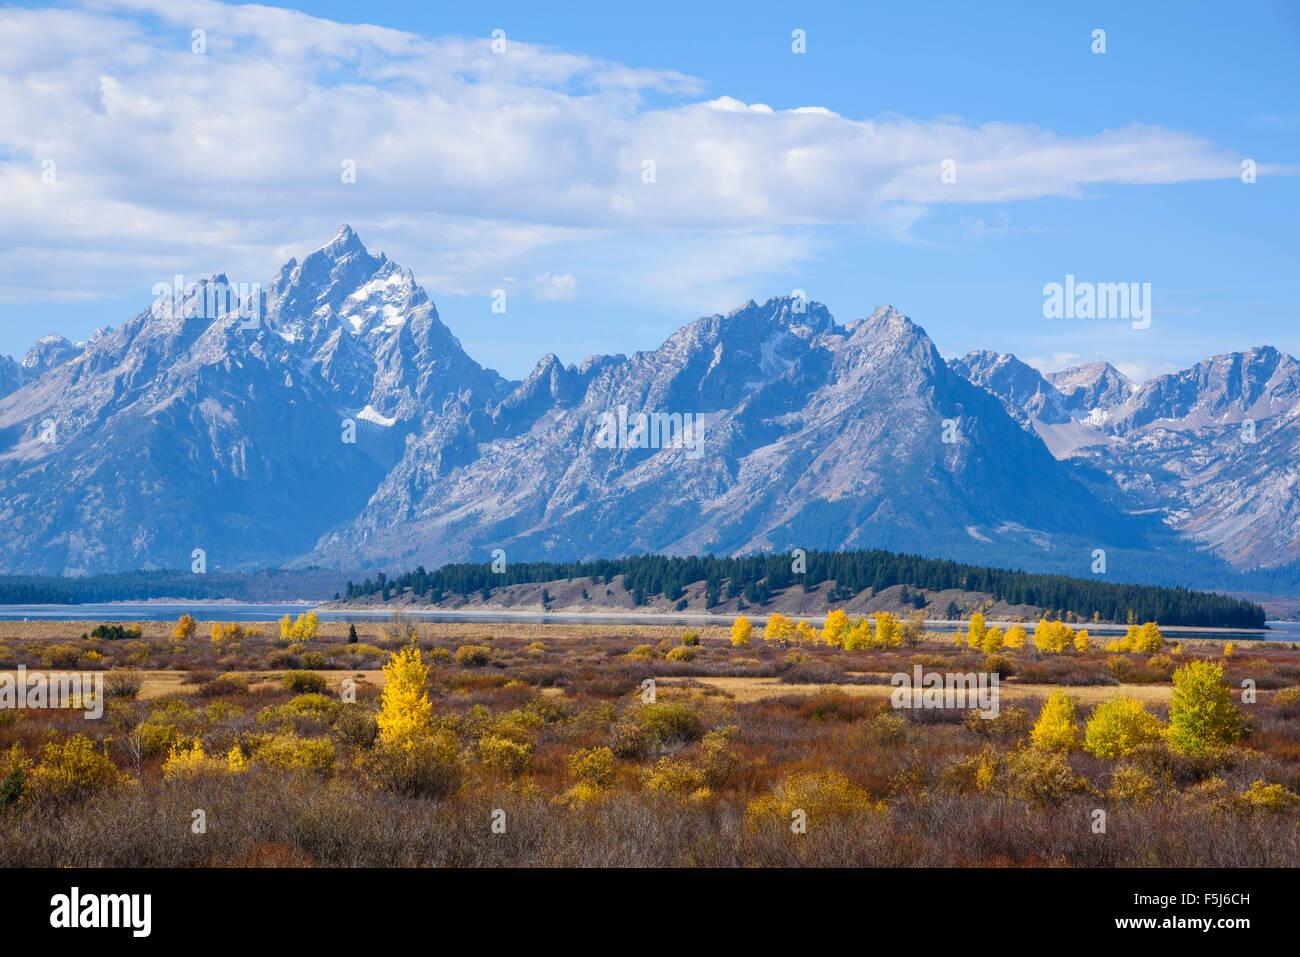 Willow Flats looking towards the Teton Range, Grand Tetons National Park, Wyoming, USA Stock Photo